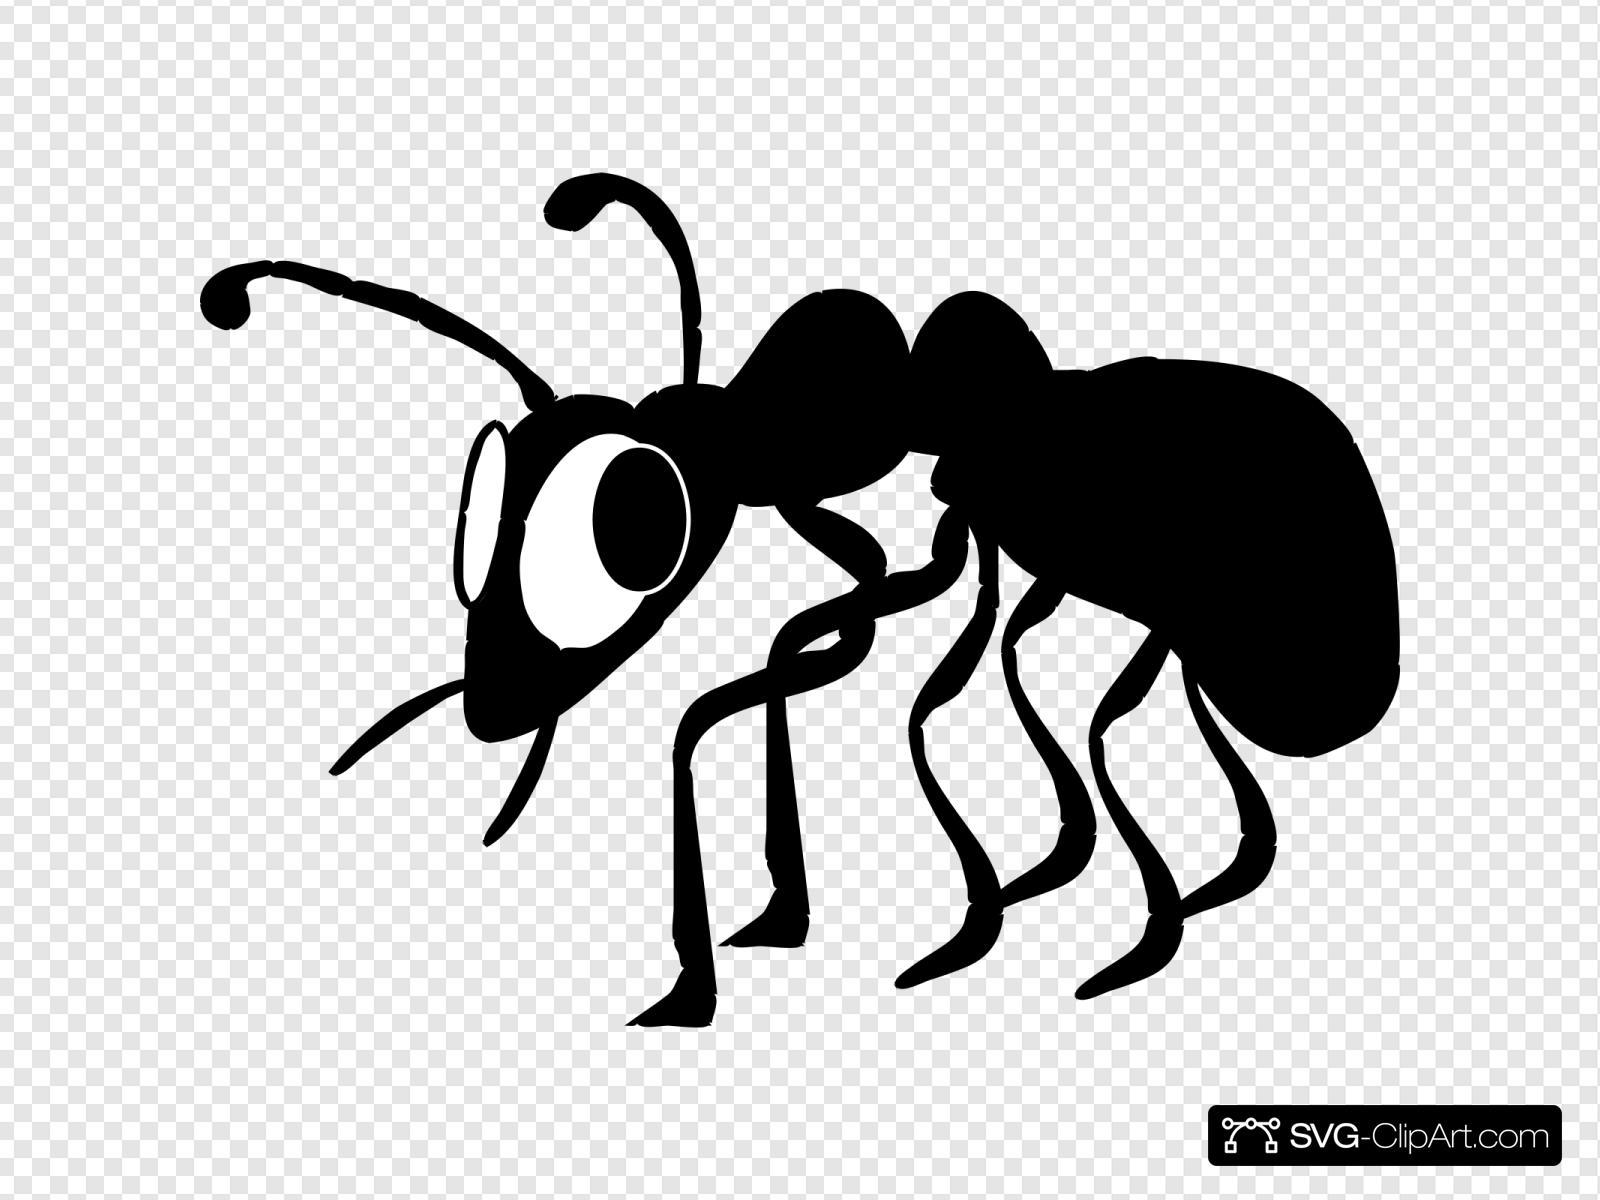 Cartoon Black Ant Svg Vector Cartoon Black Ant Clip Art Svg Clipart